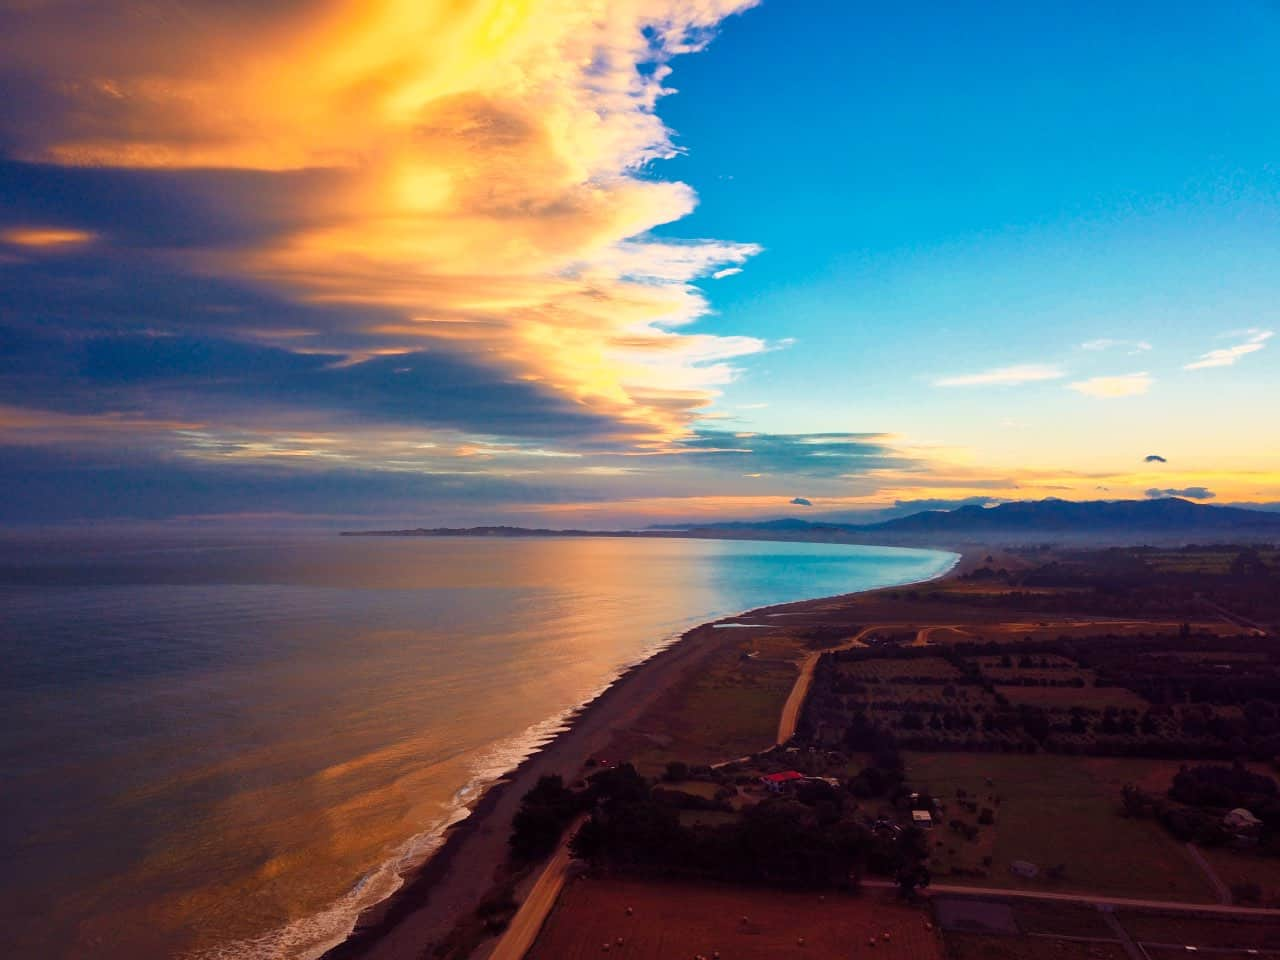 Kaikoura-Fredom-Camp-beautiful-sky-sunset-DJI-Mavic-Pro